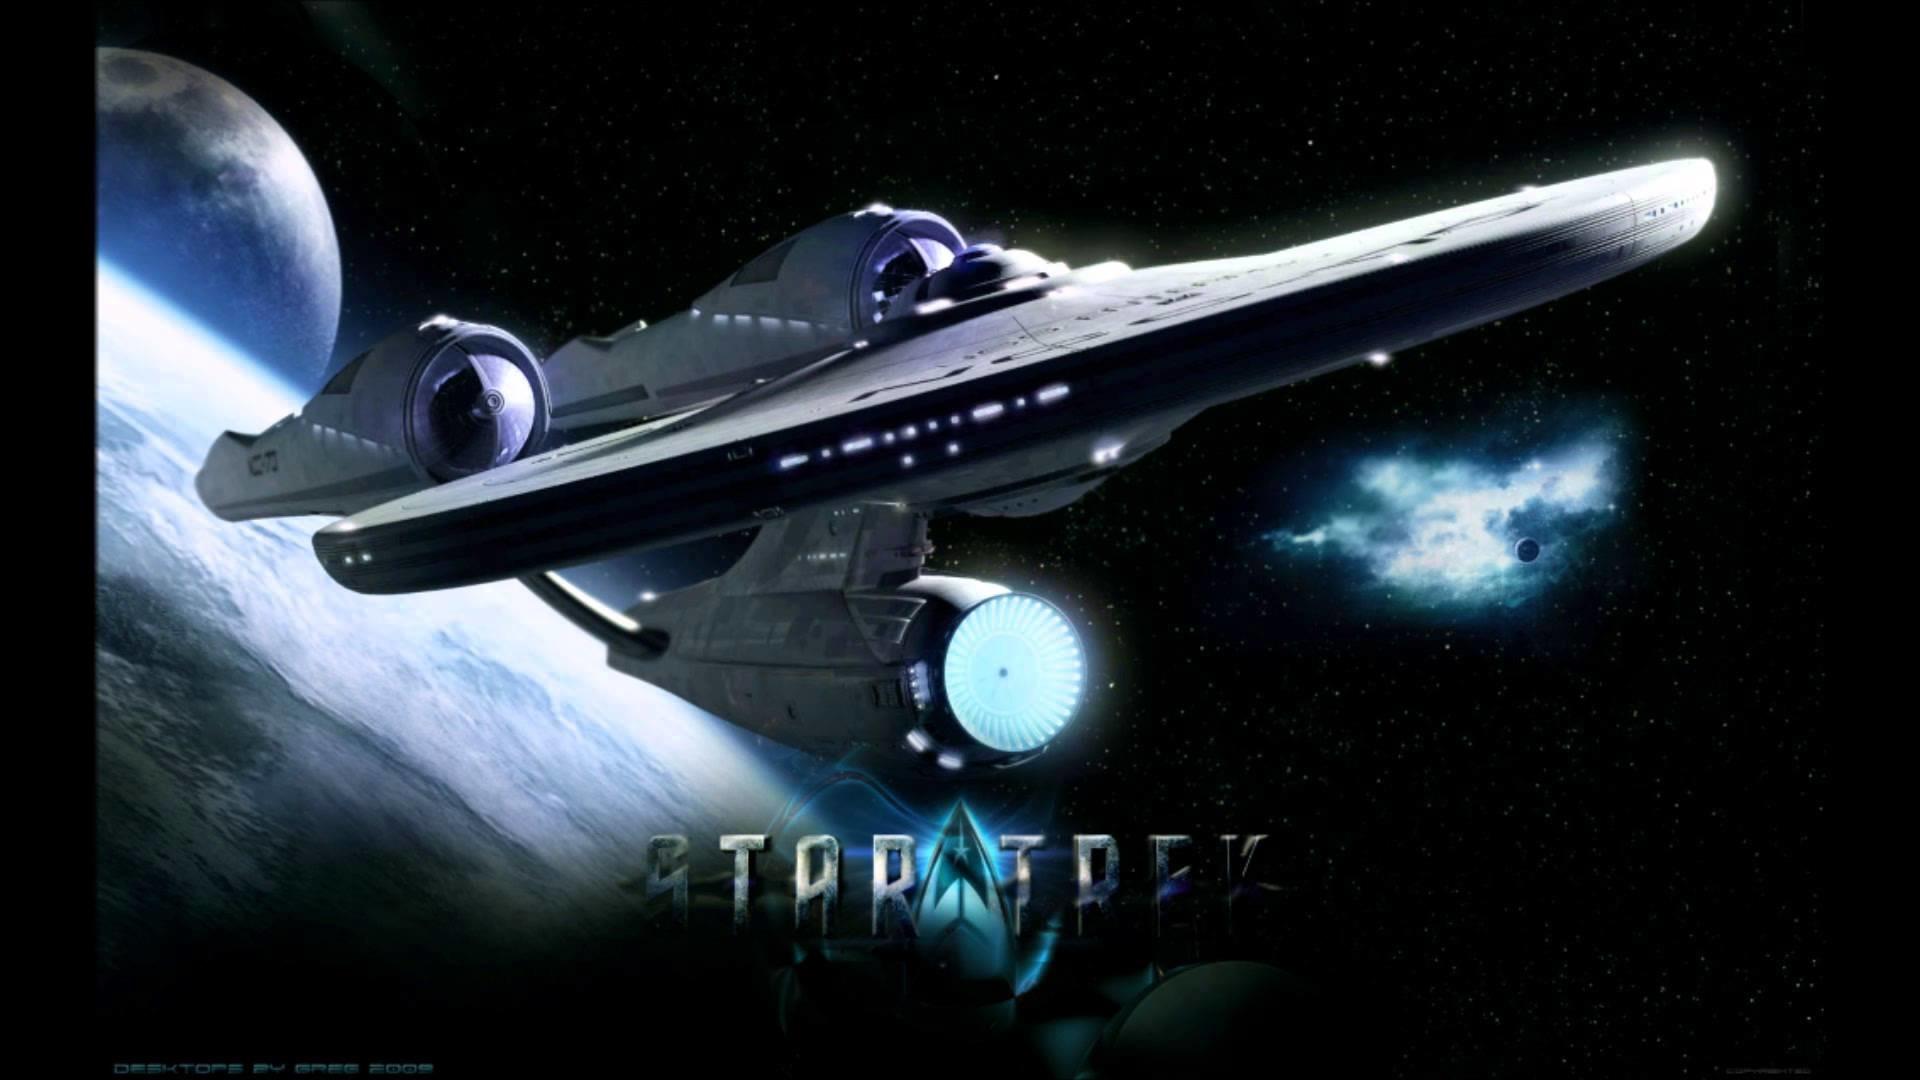 Star Trek iPhone 6 Wallpaper – iPhone 6 Wallpaper